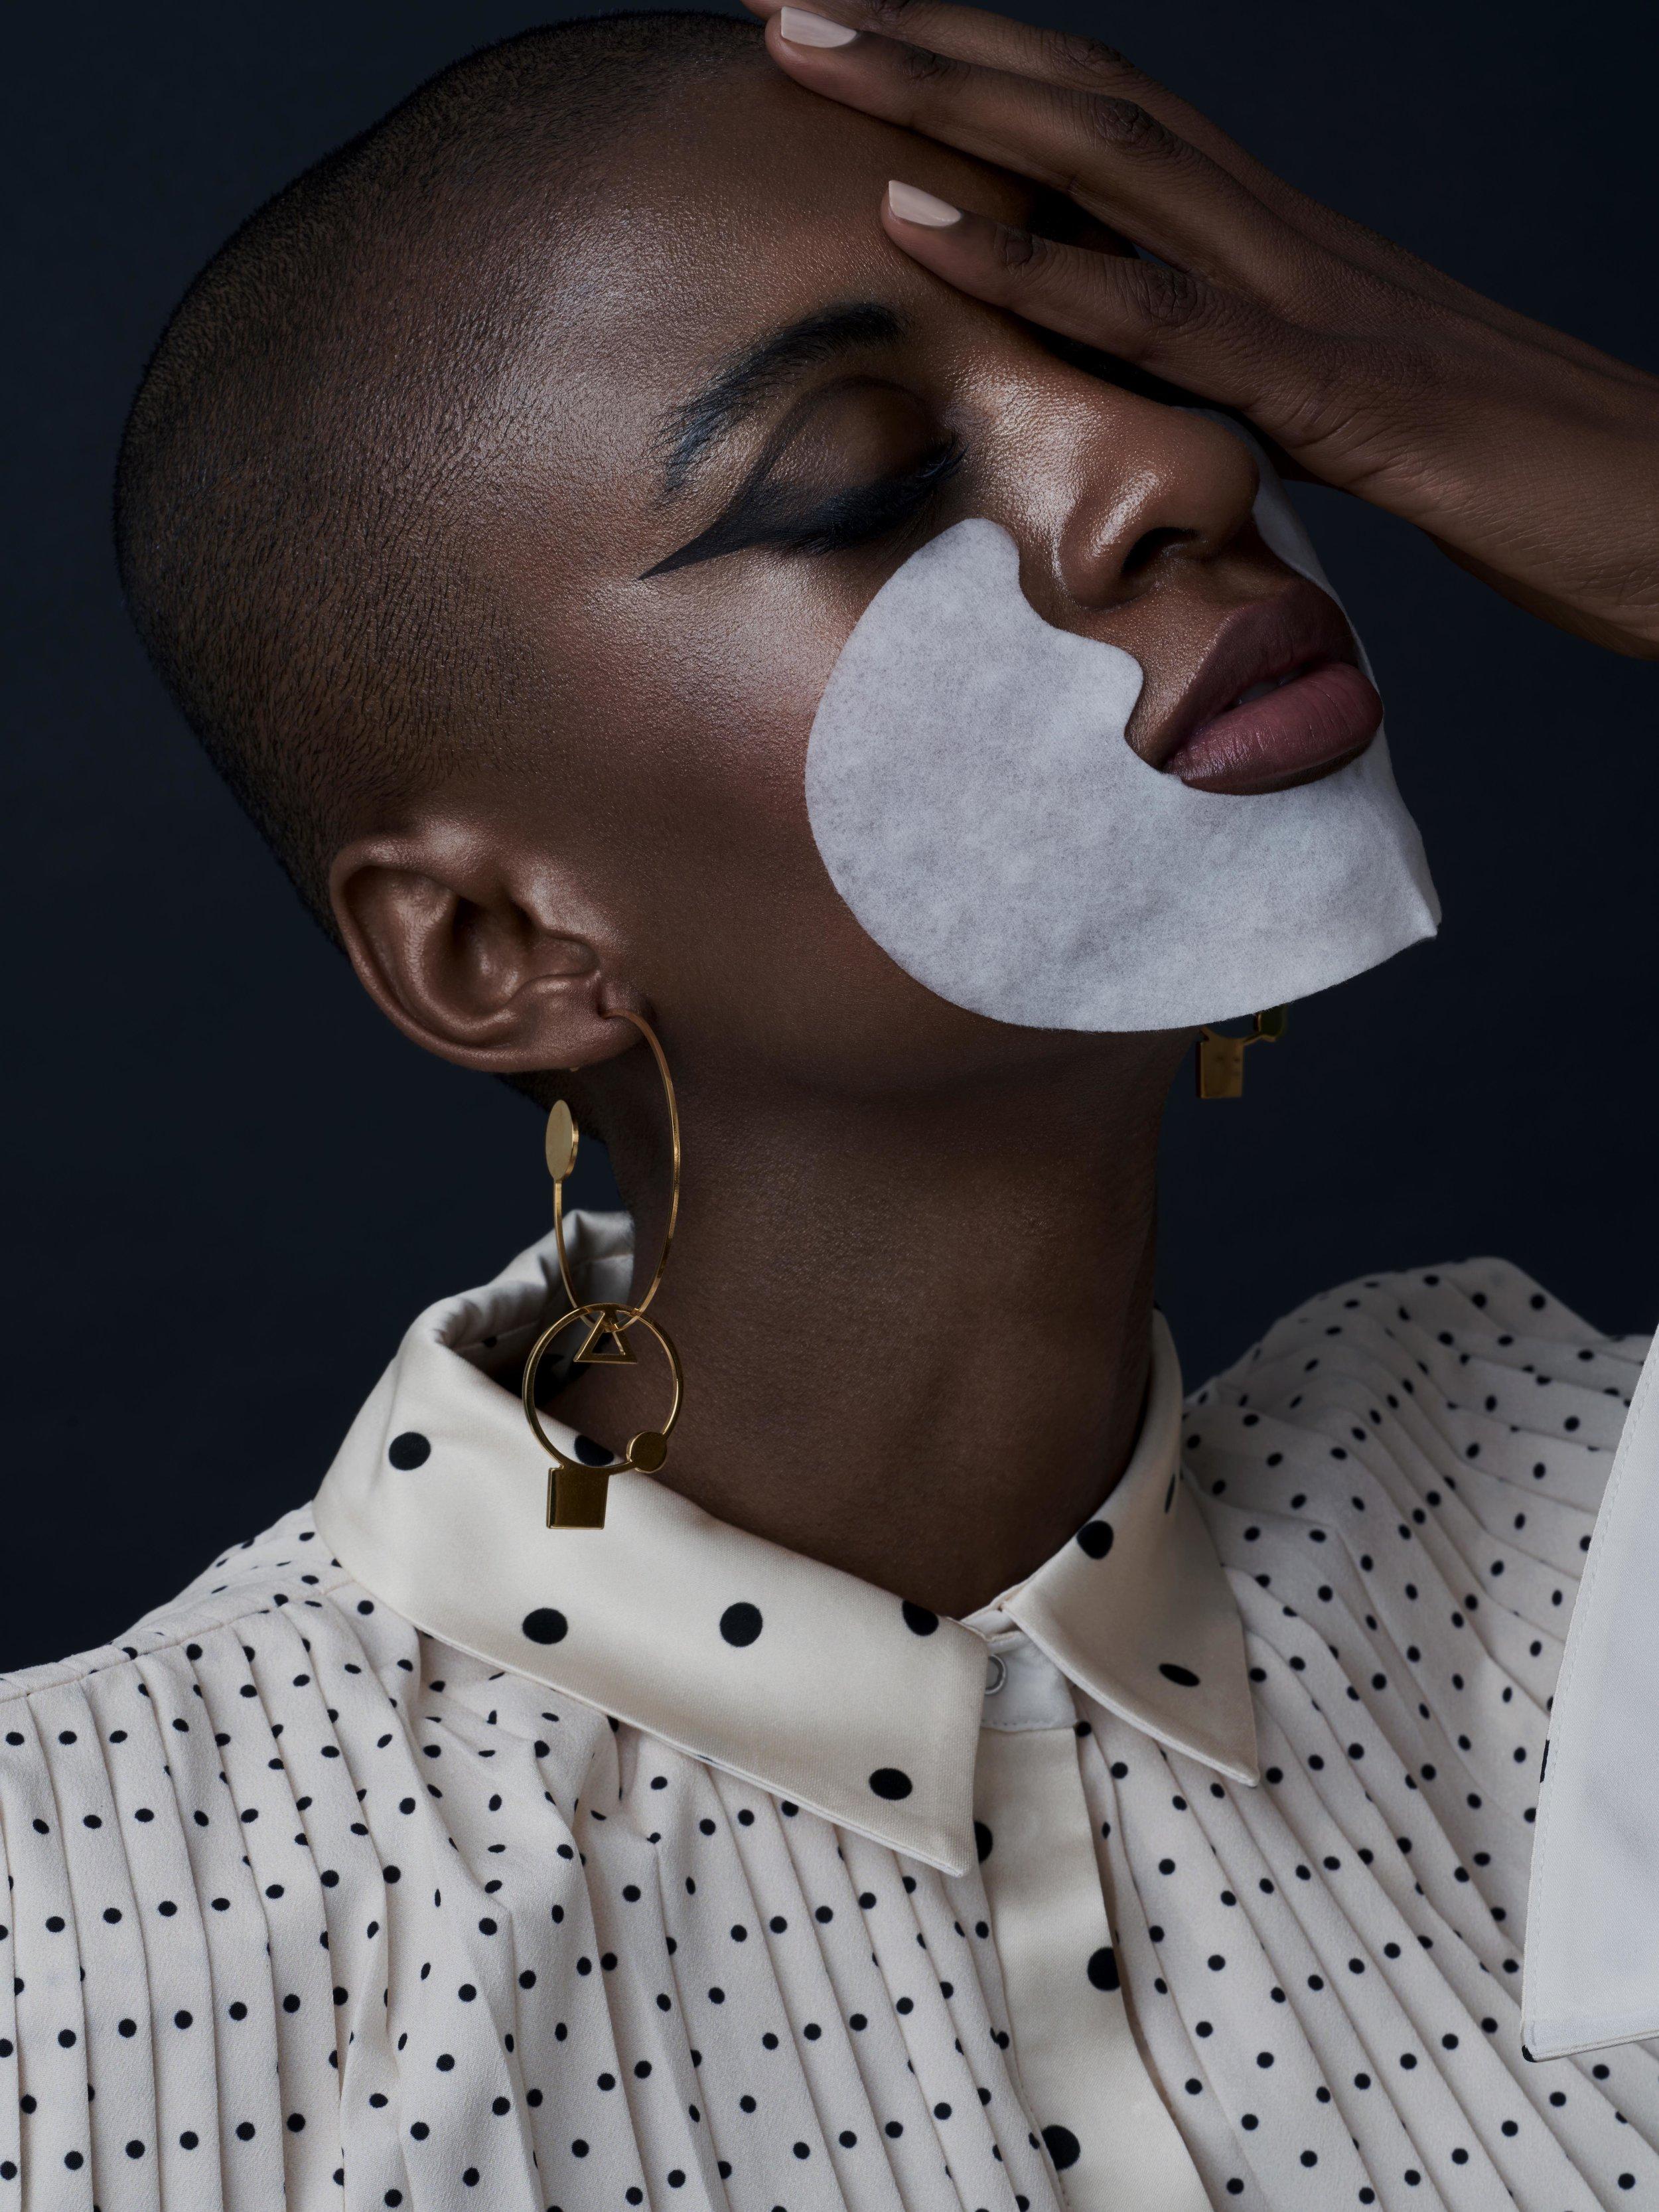 Eliana | M4 Models